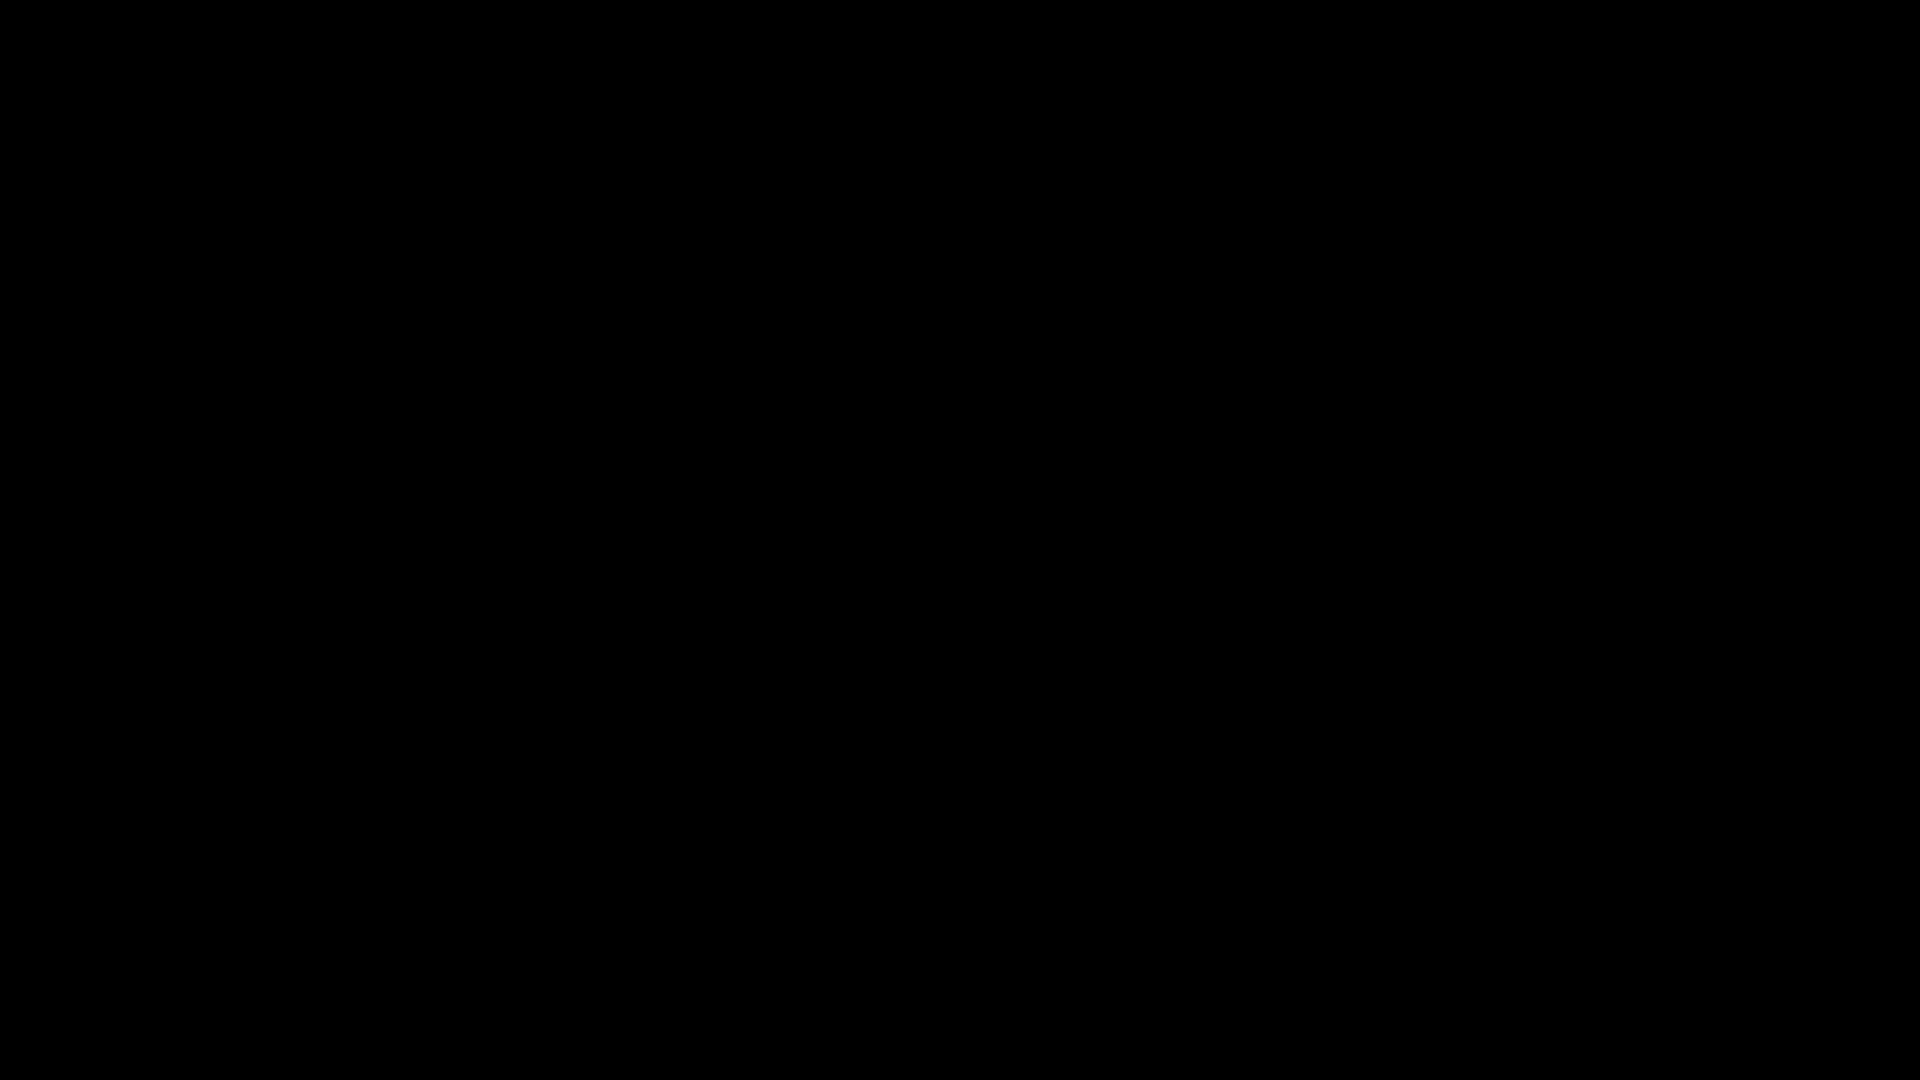 Cutscene, Cutscenes, Gaming, Helsionium, Japanese, Monolith, Monolith Soft, Nintendo, Subs, Subtitles, Takahashi, Tetsuya Takahashi, Xeno, Xenoblade, Xenoblade 2, Xenoblade Chronicles, Xenoblade Chronicles 2, Xenoblade Chronicles 2 Cutscene 056 - Wrong Room, Mythra! - JAPANESE GIFs